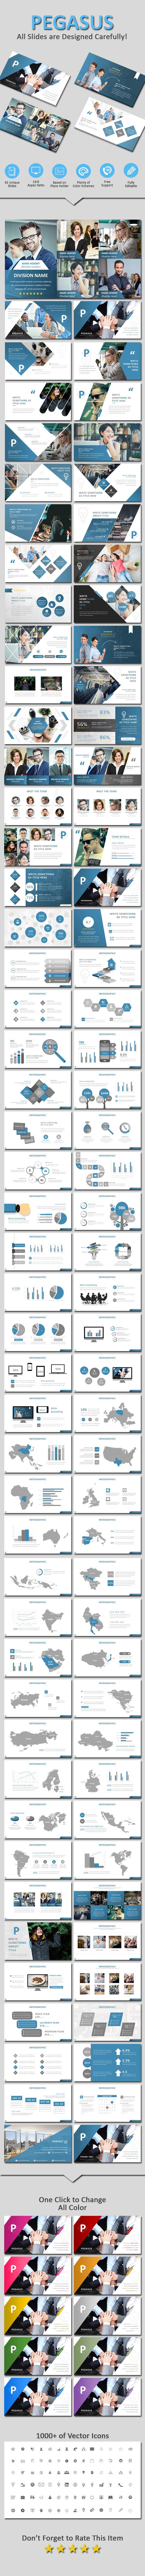 Pegasus Creative Powerpoint - Business PowerPoint Templates